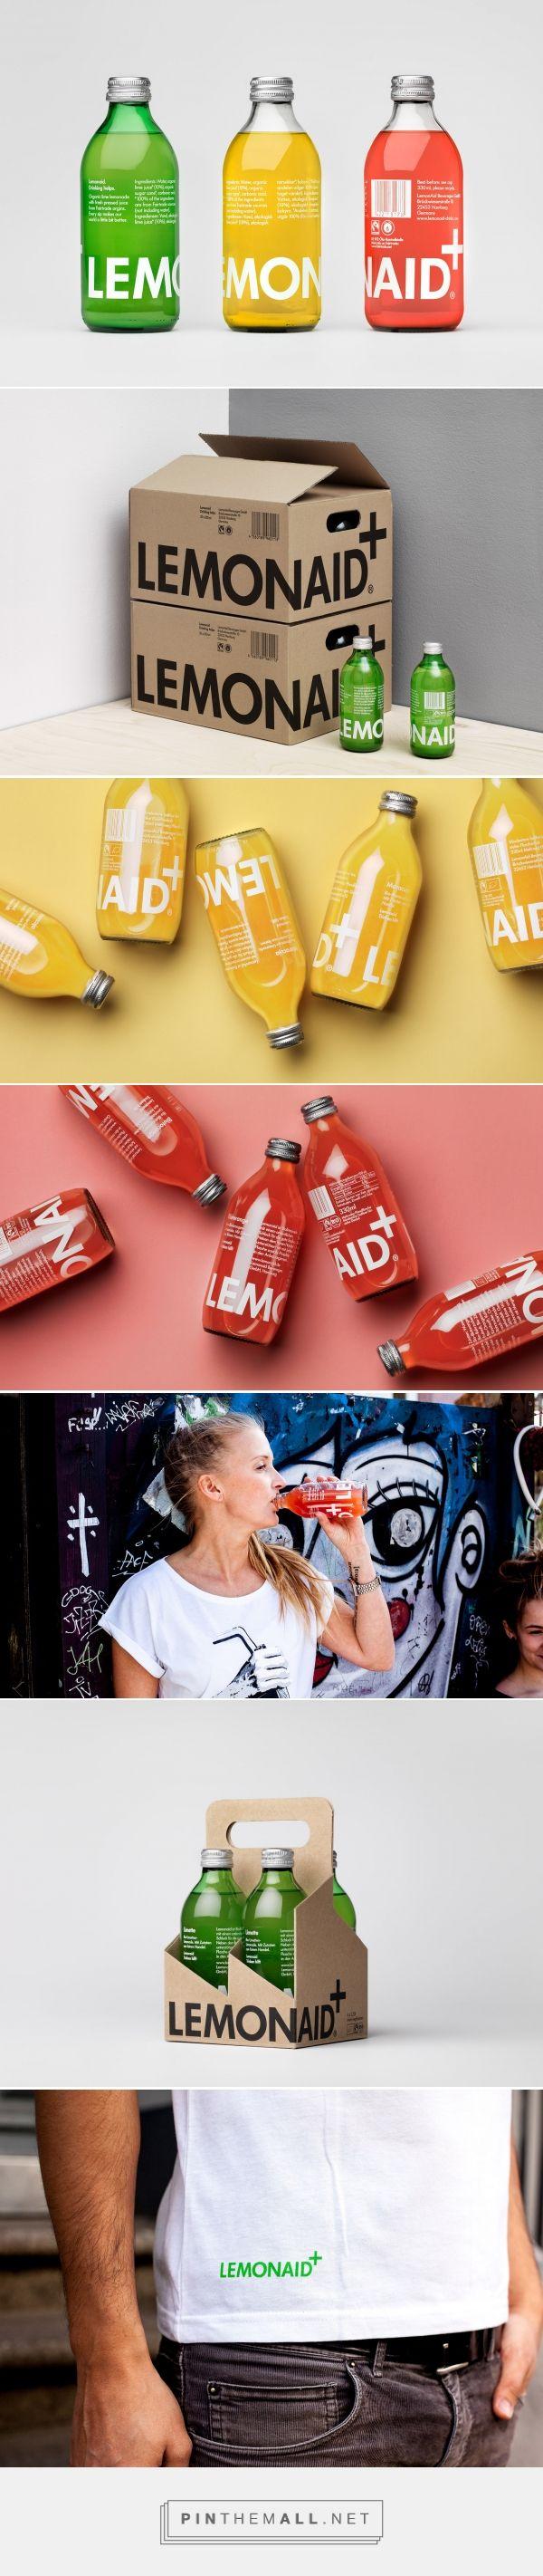 Lemonaid Brand Beverage Packaging by The Studio | Fivestar Branding Agency – Design and Branding Agency & Inspiration Gallery More